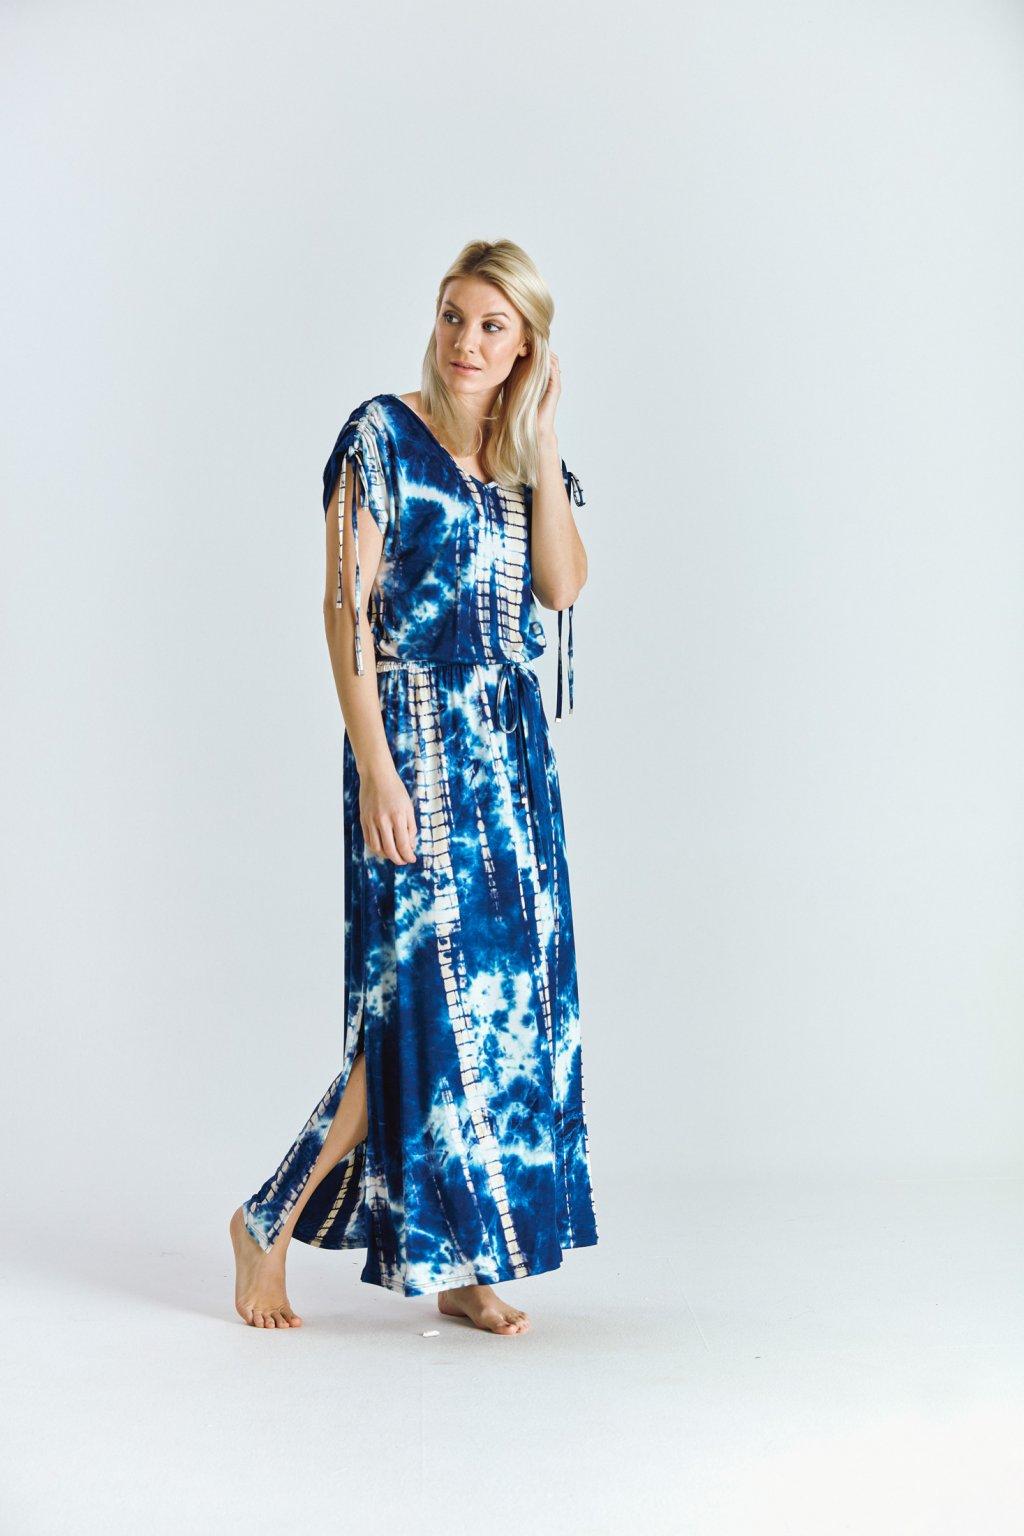 Dámské boho šaty batika modrá